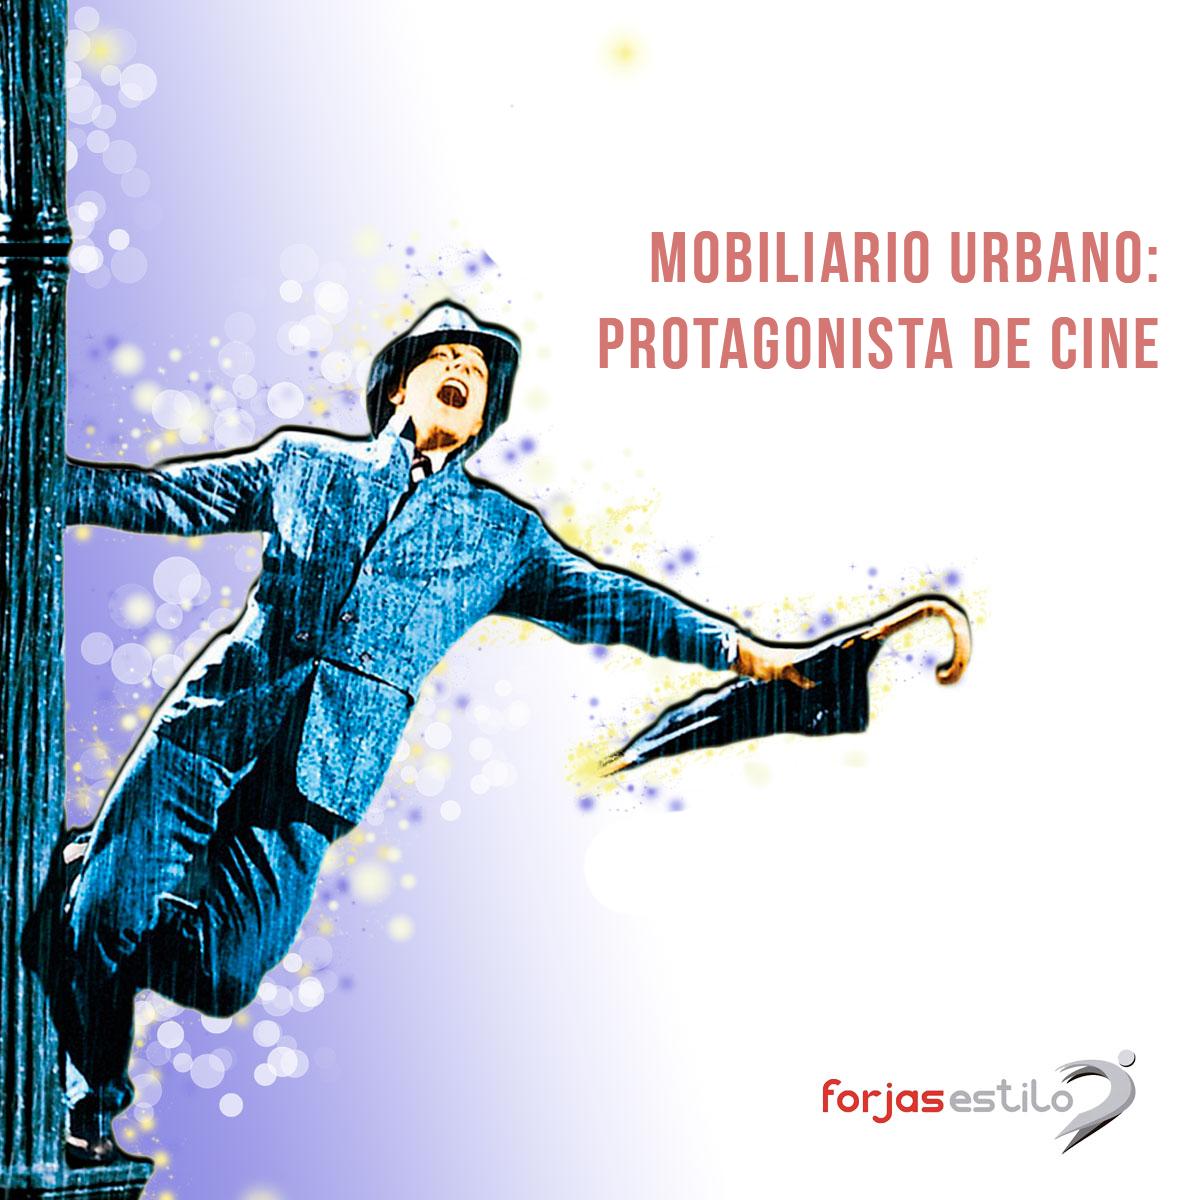 Mobiliariourbano-protagonistacine.png